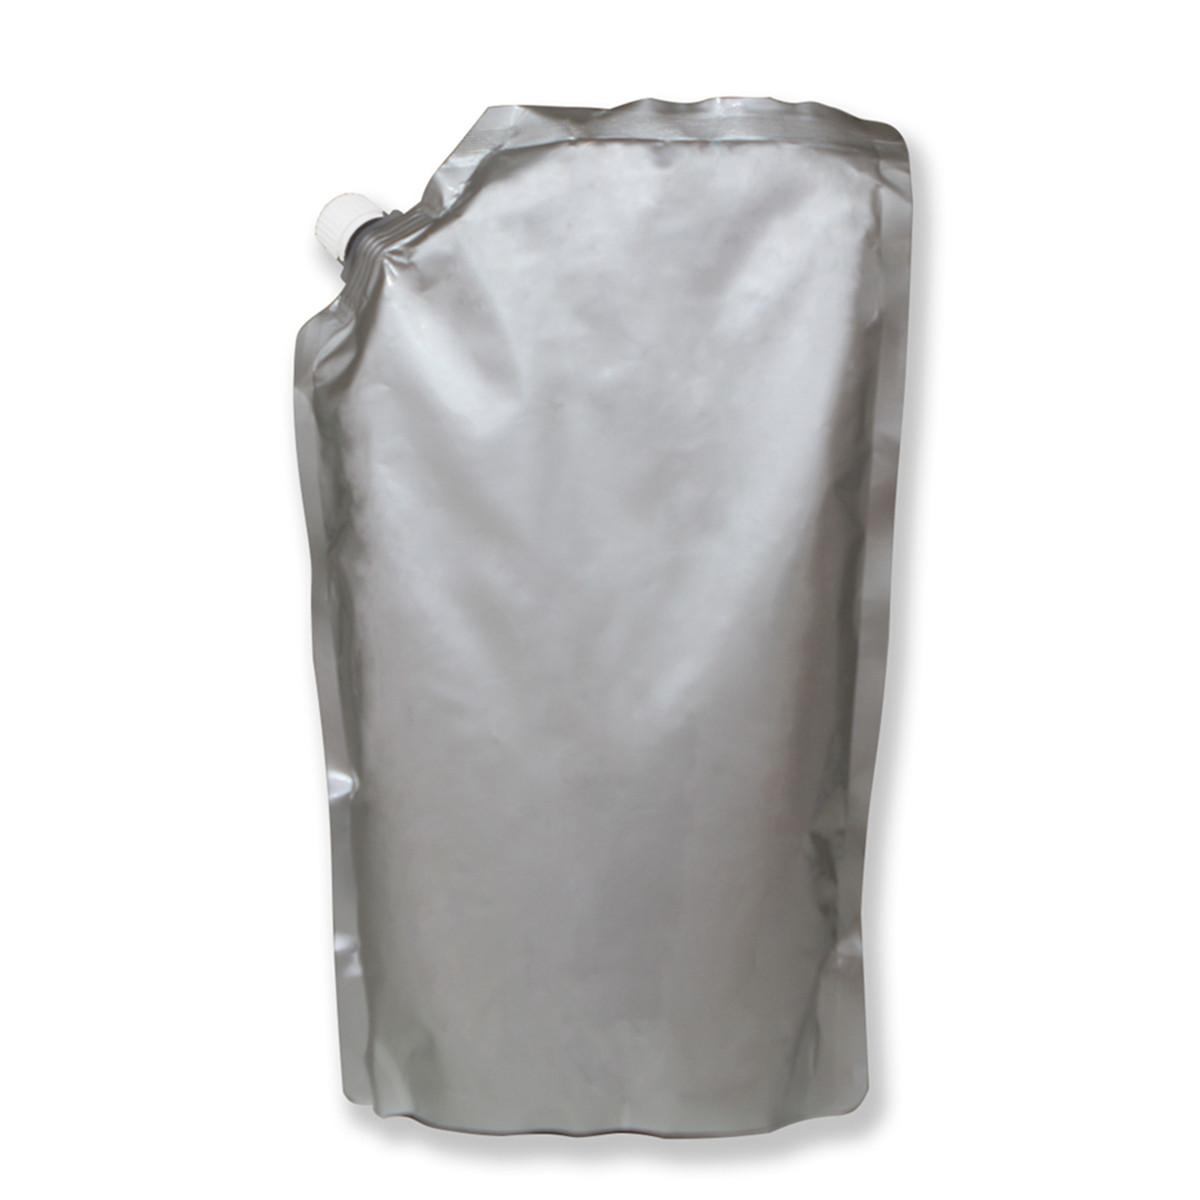 Toner Refil HP C4127A   4000 4000N 4000SE 4000T 4000TN 4050 4050N 4050SE 4050T 4050TN   Jadi 1kg